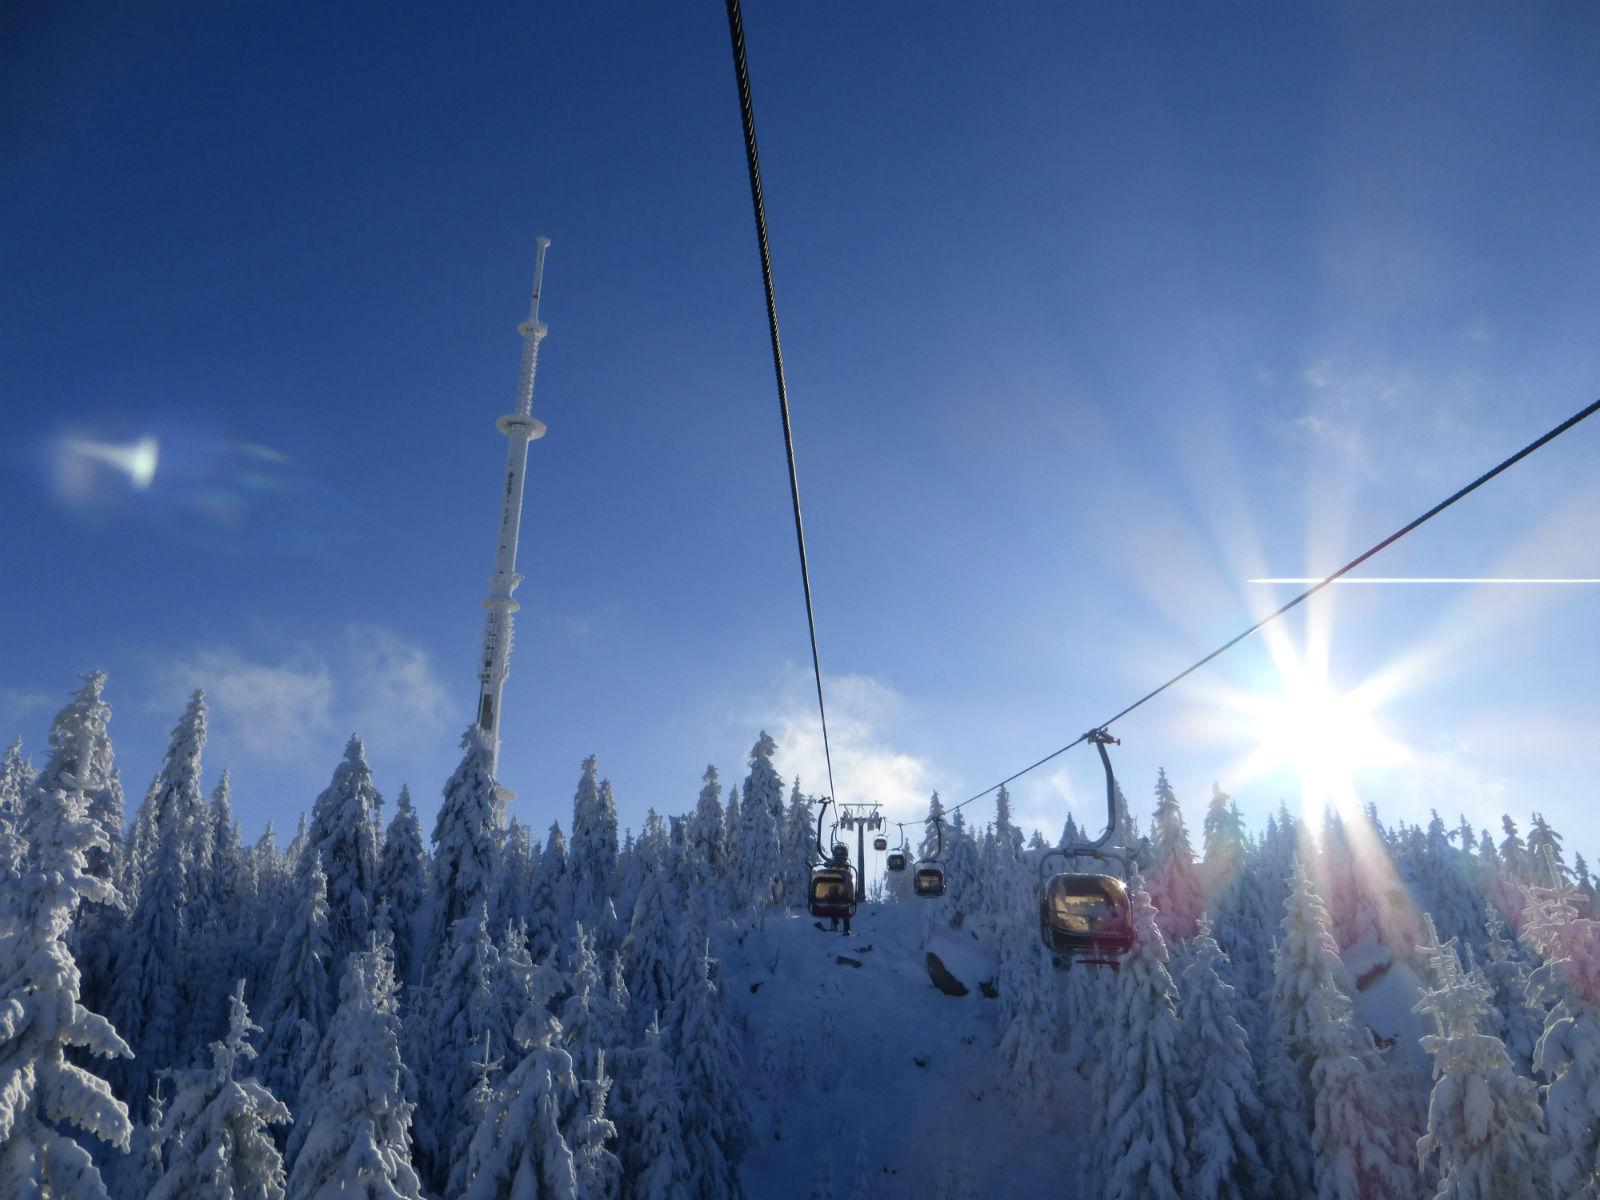 skifahren-fichtelgebirge